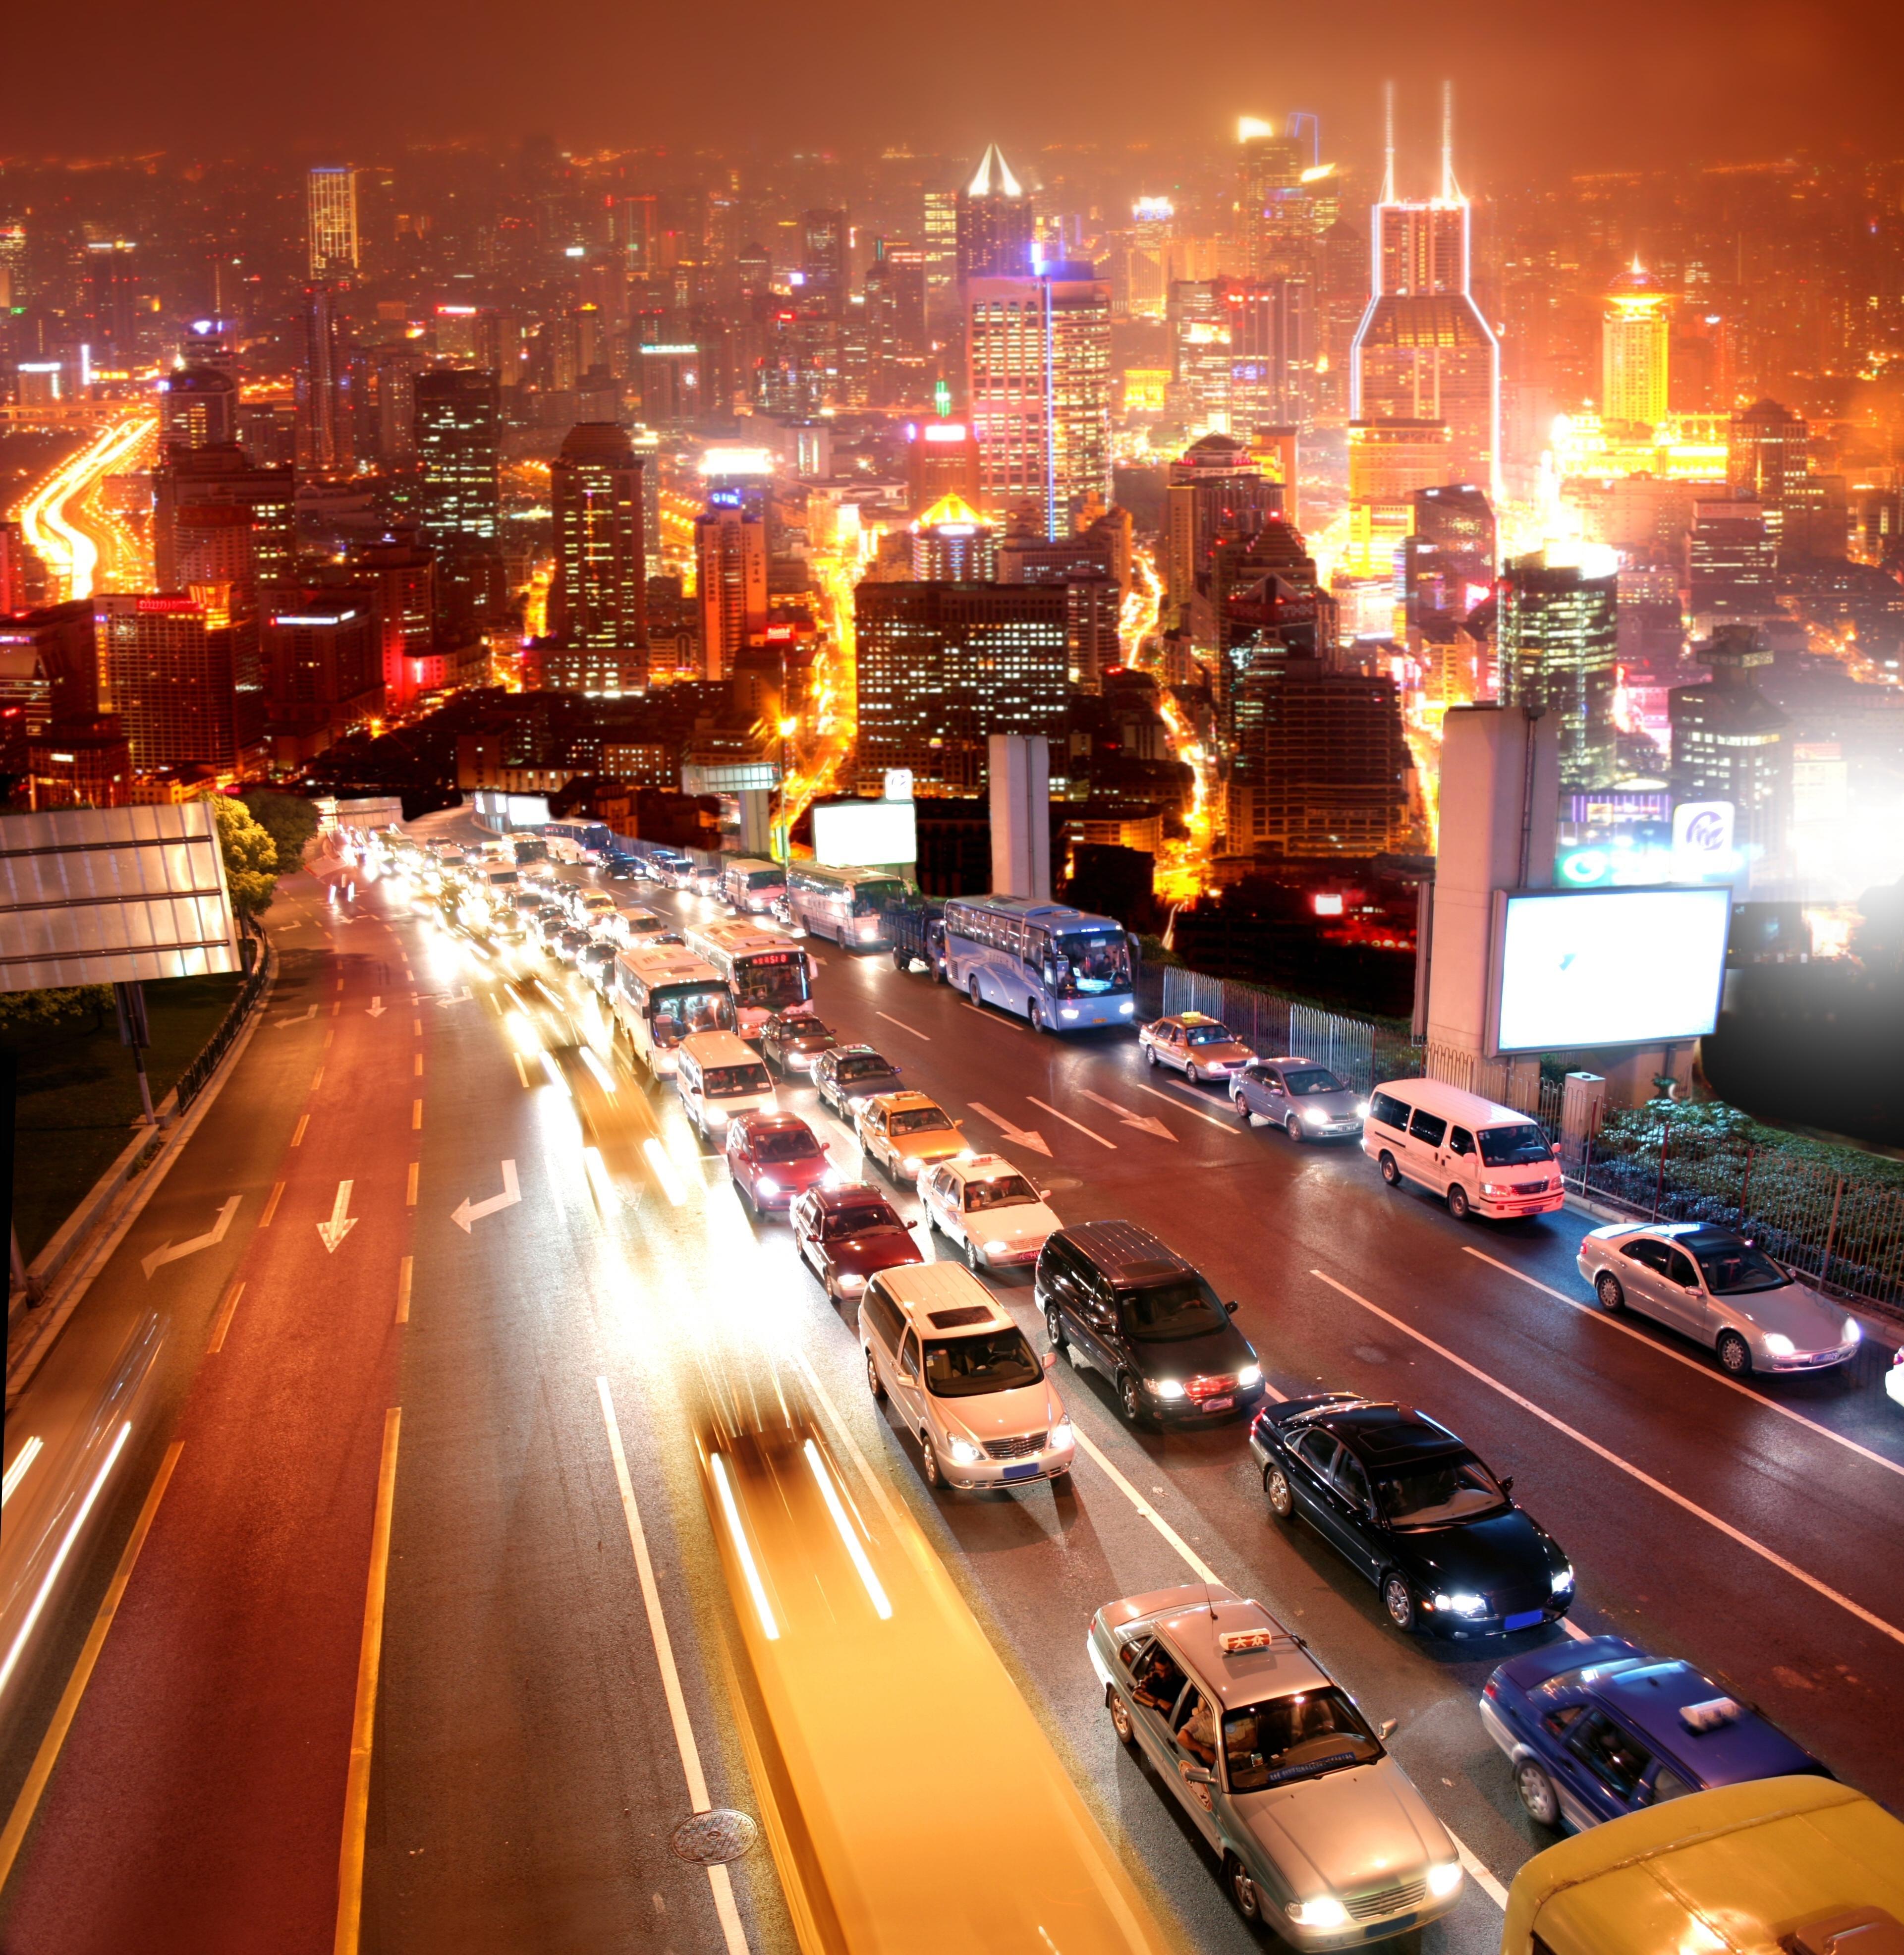 Свет города (03-10-2009)